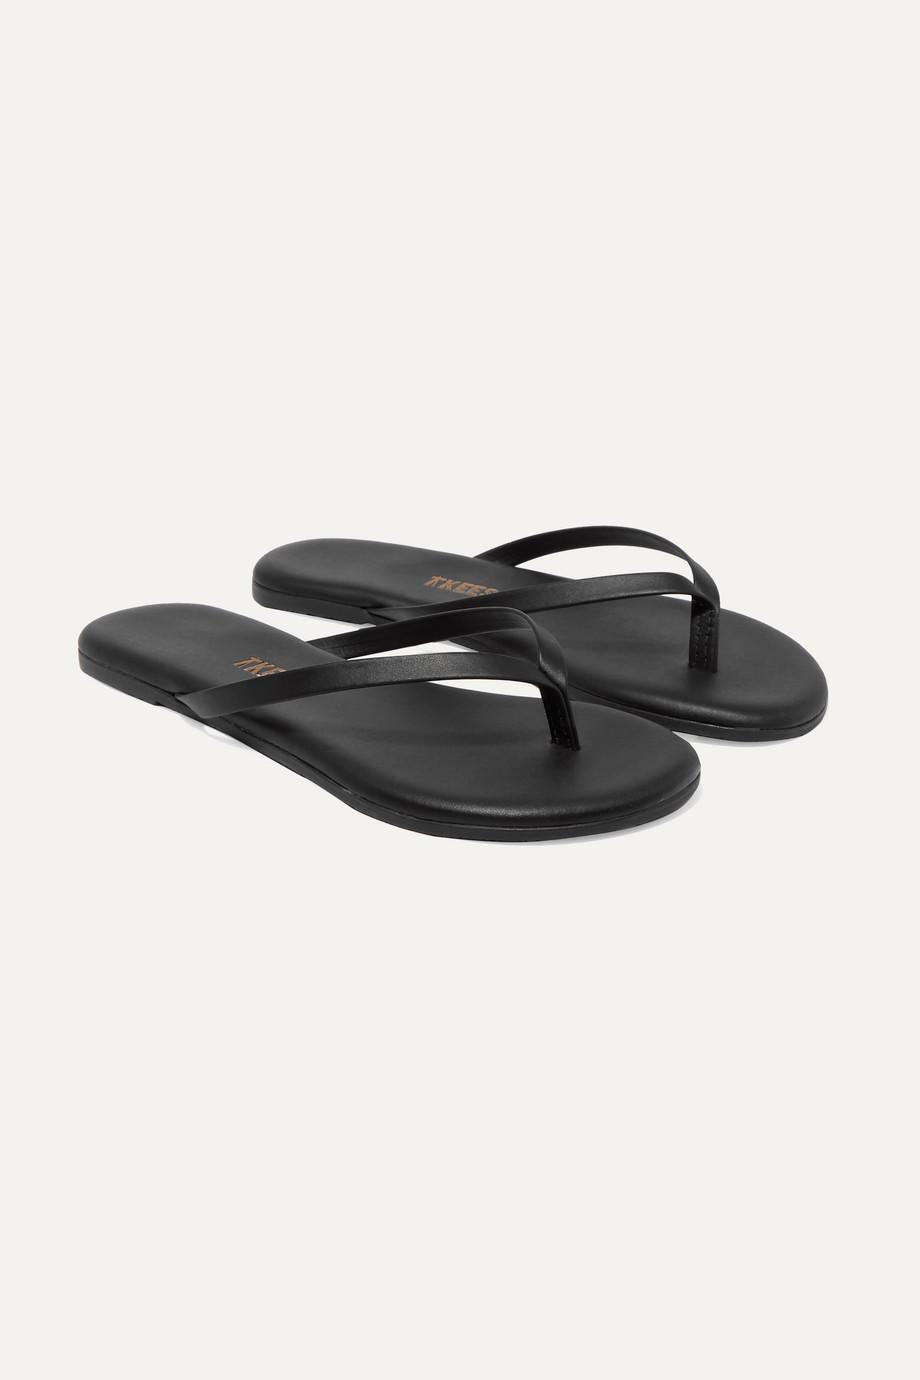 TKEES Kids Leather flip flops